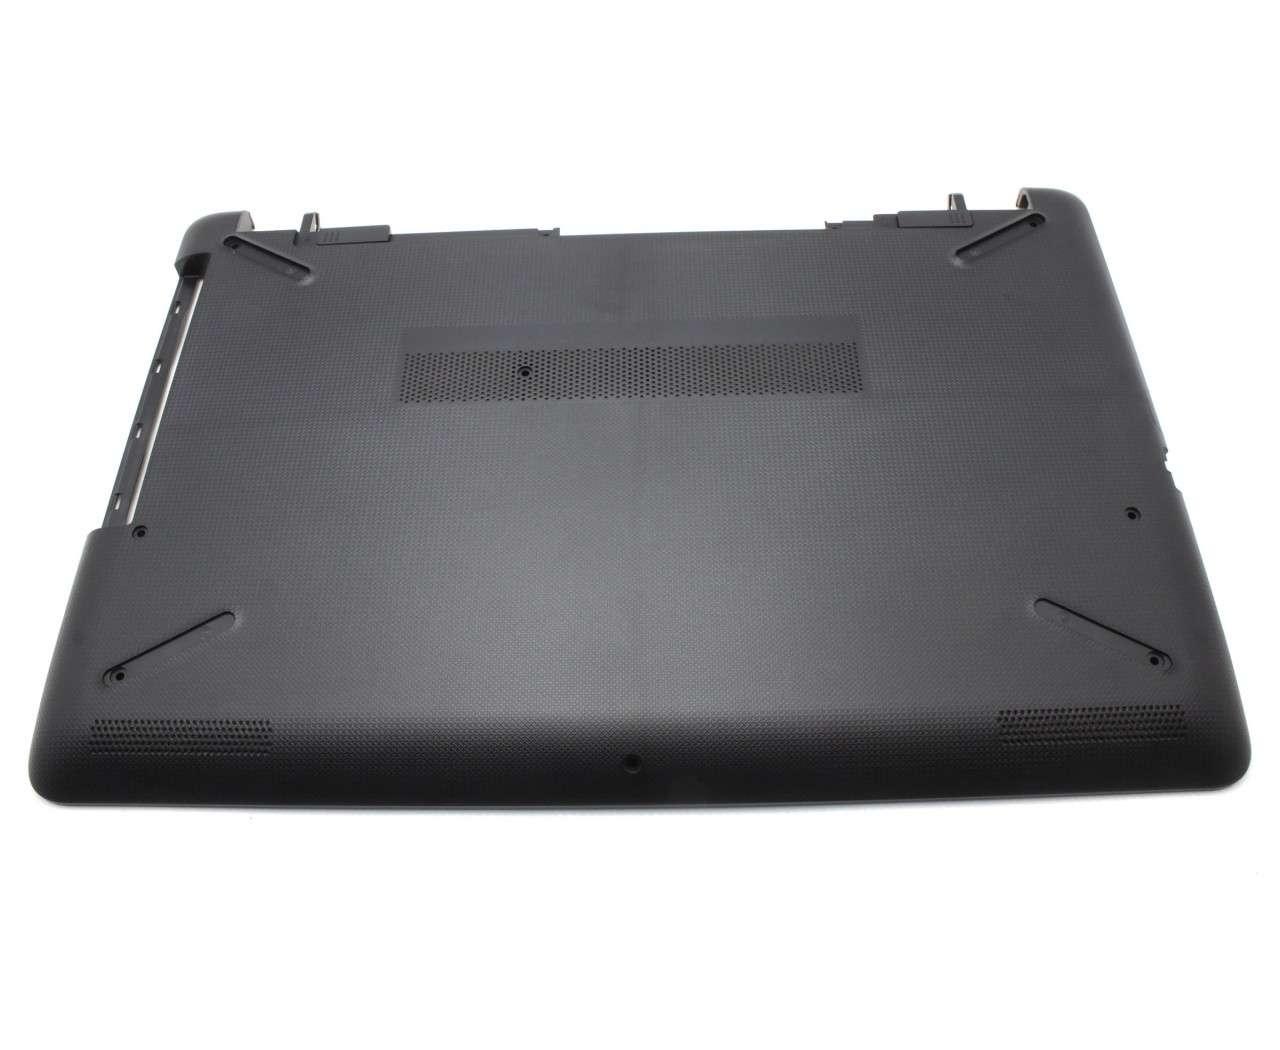 Bottom Case HP 924907-001 Carcasa Inferioara Neagra fara Port VGA imagine powerlaptop.ro 2021